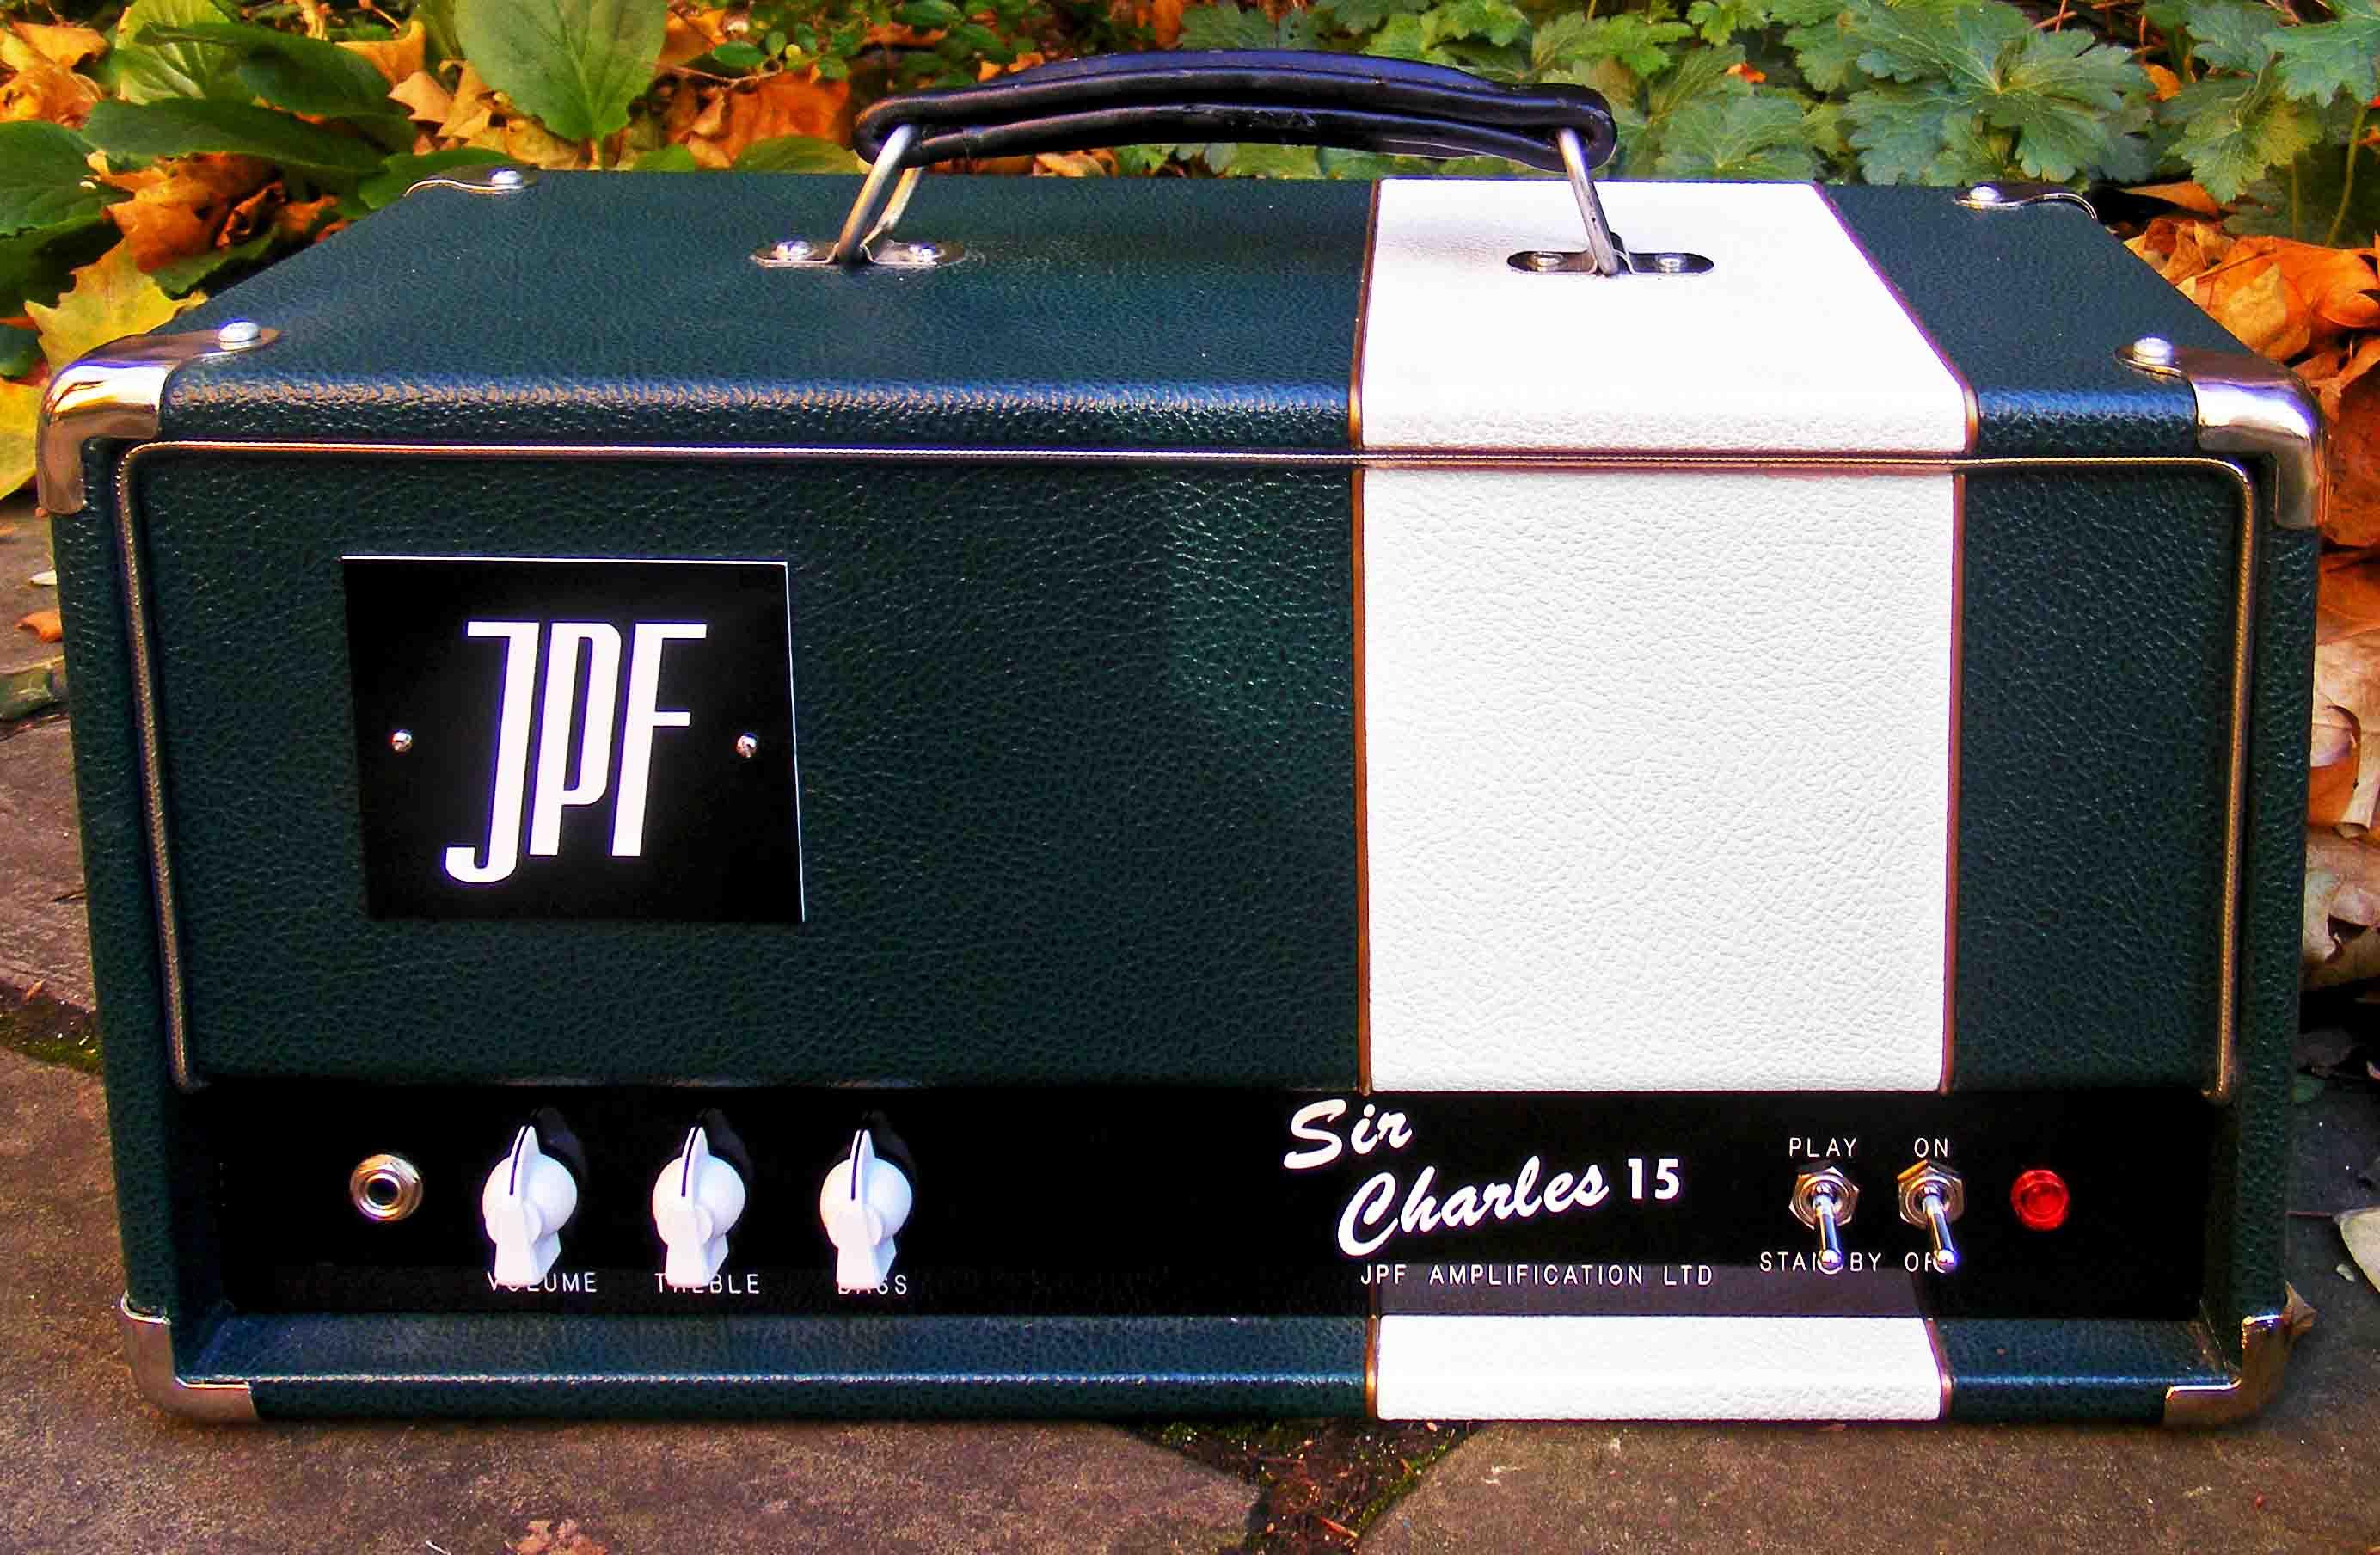 The JPF Sir Charles 15 Amp